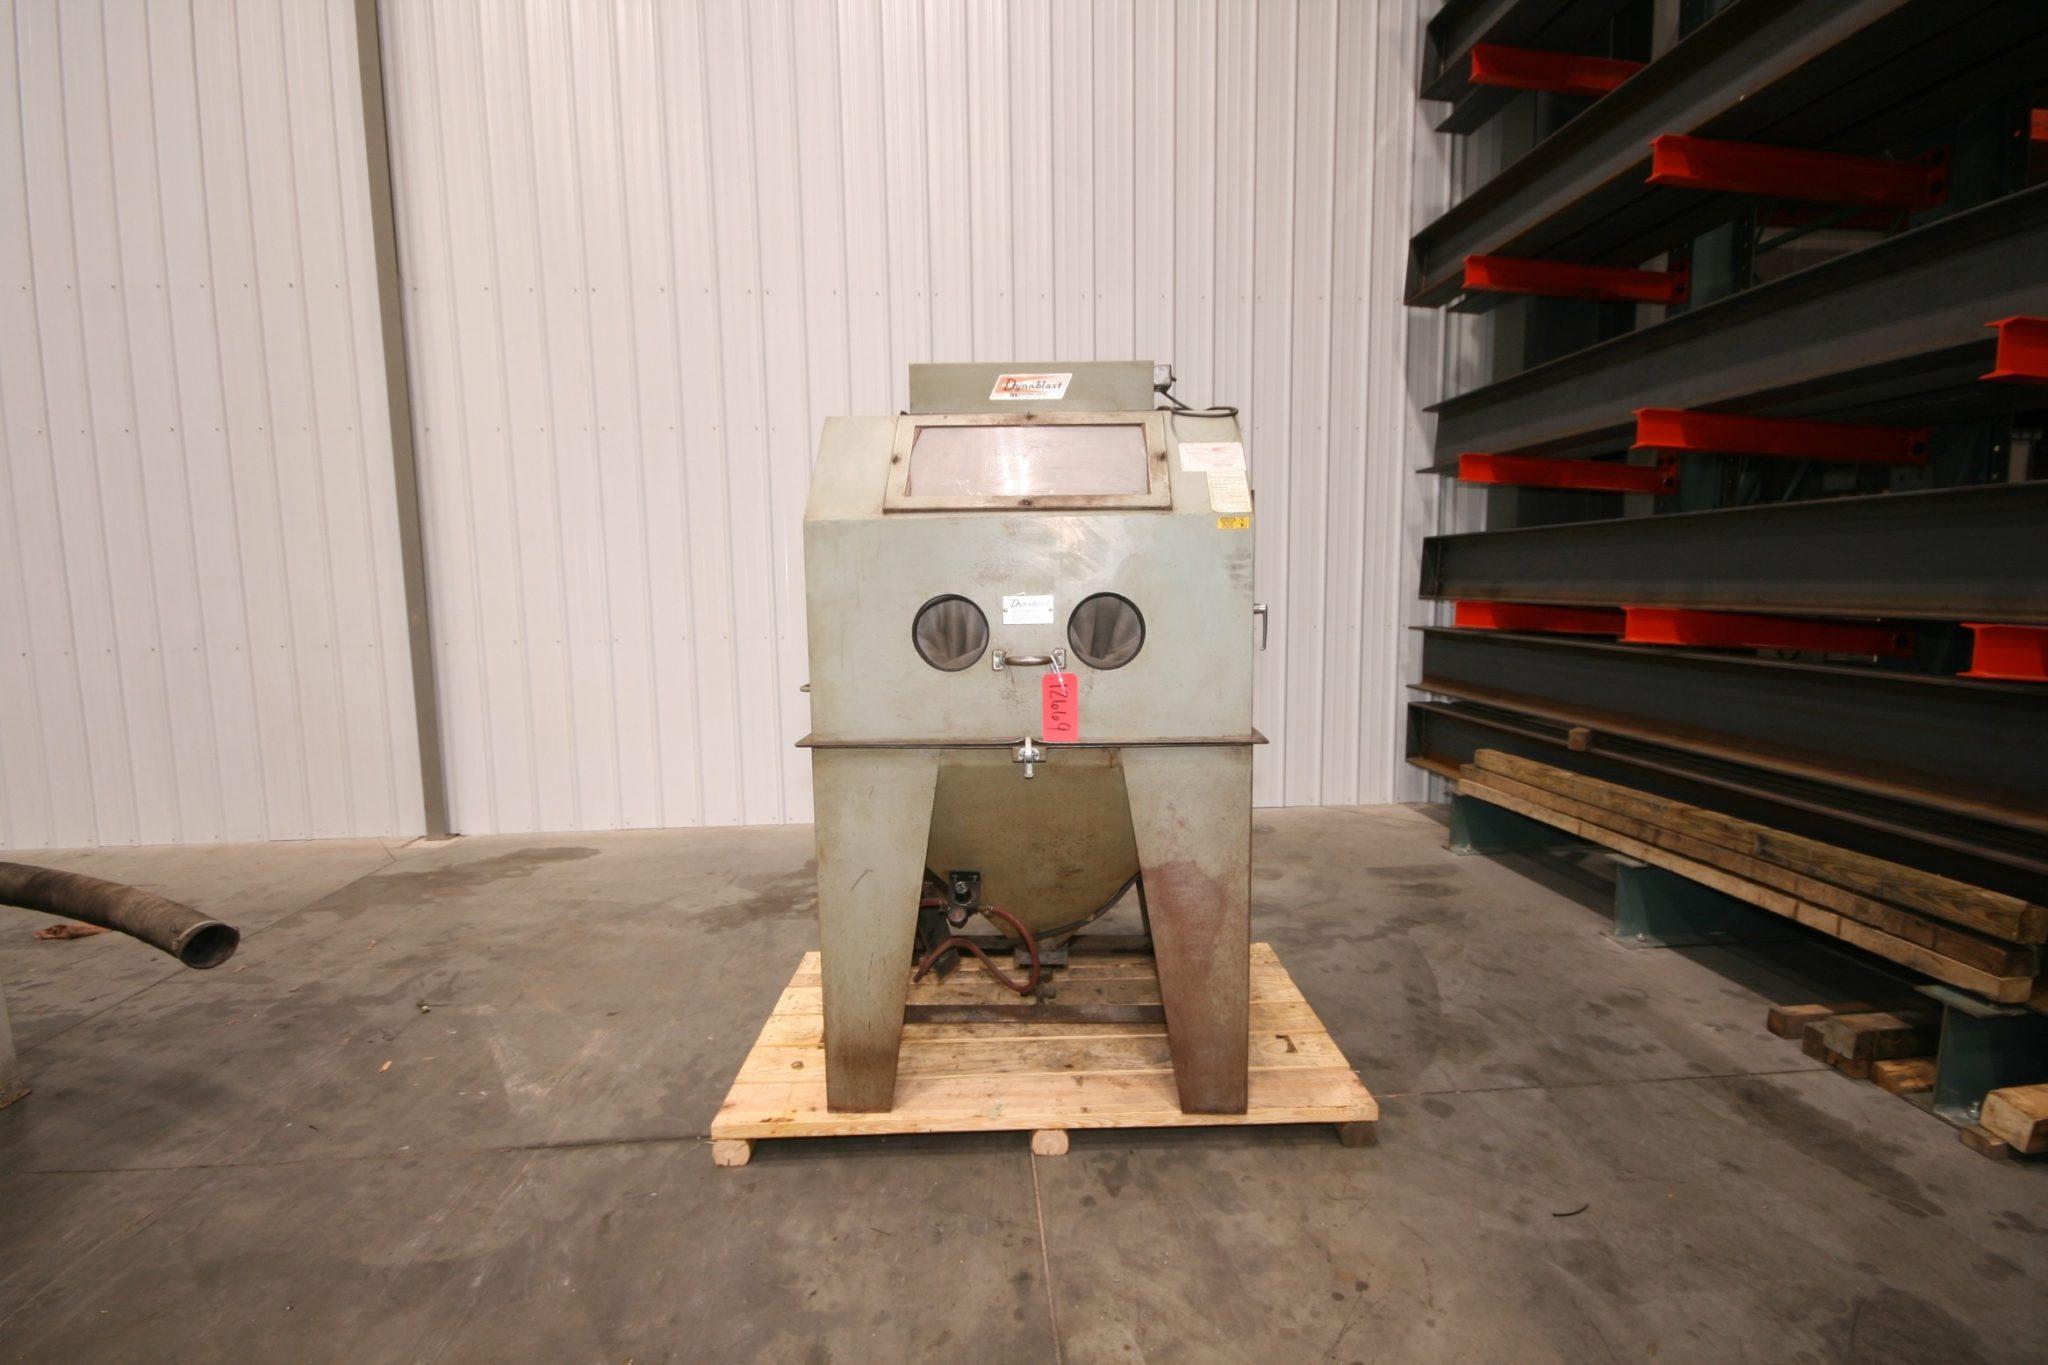 marine cabinet sandblast sand speedo blasting equipment blast and